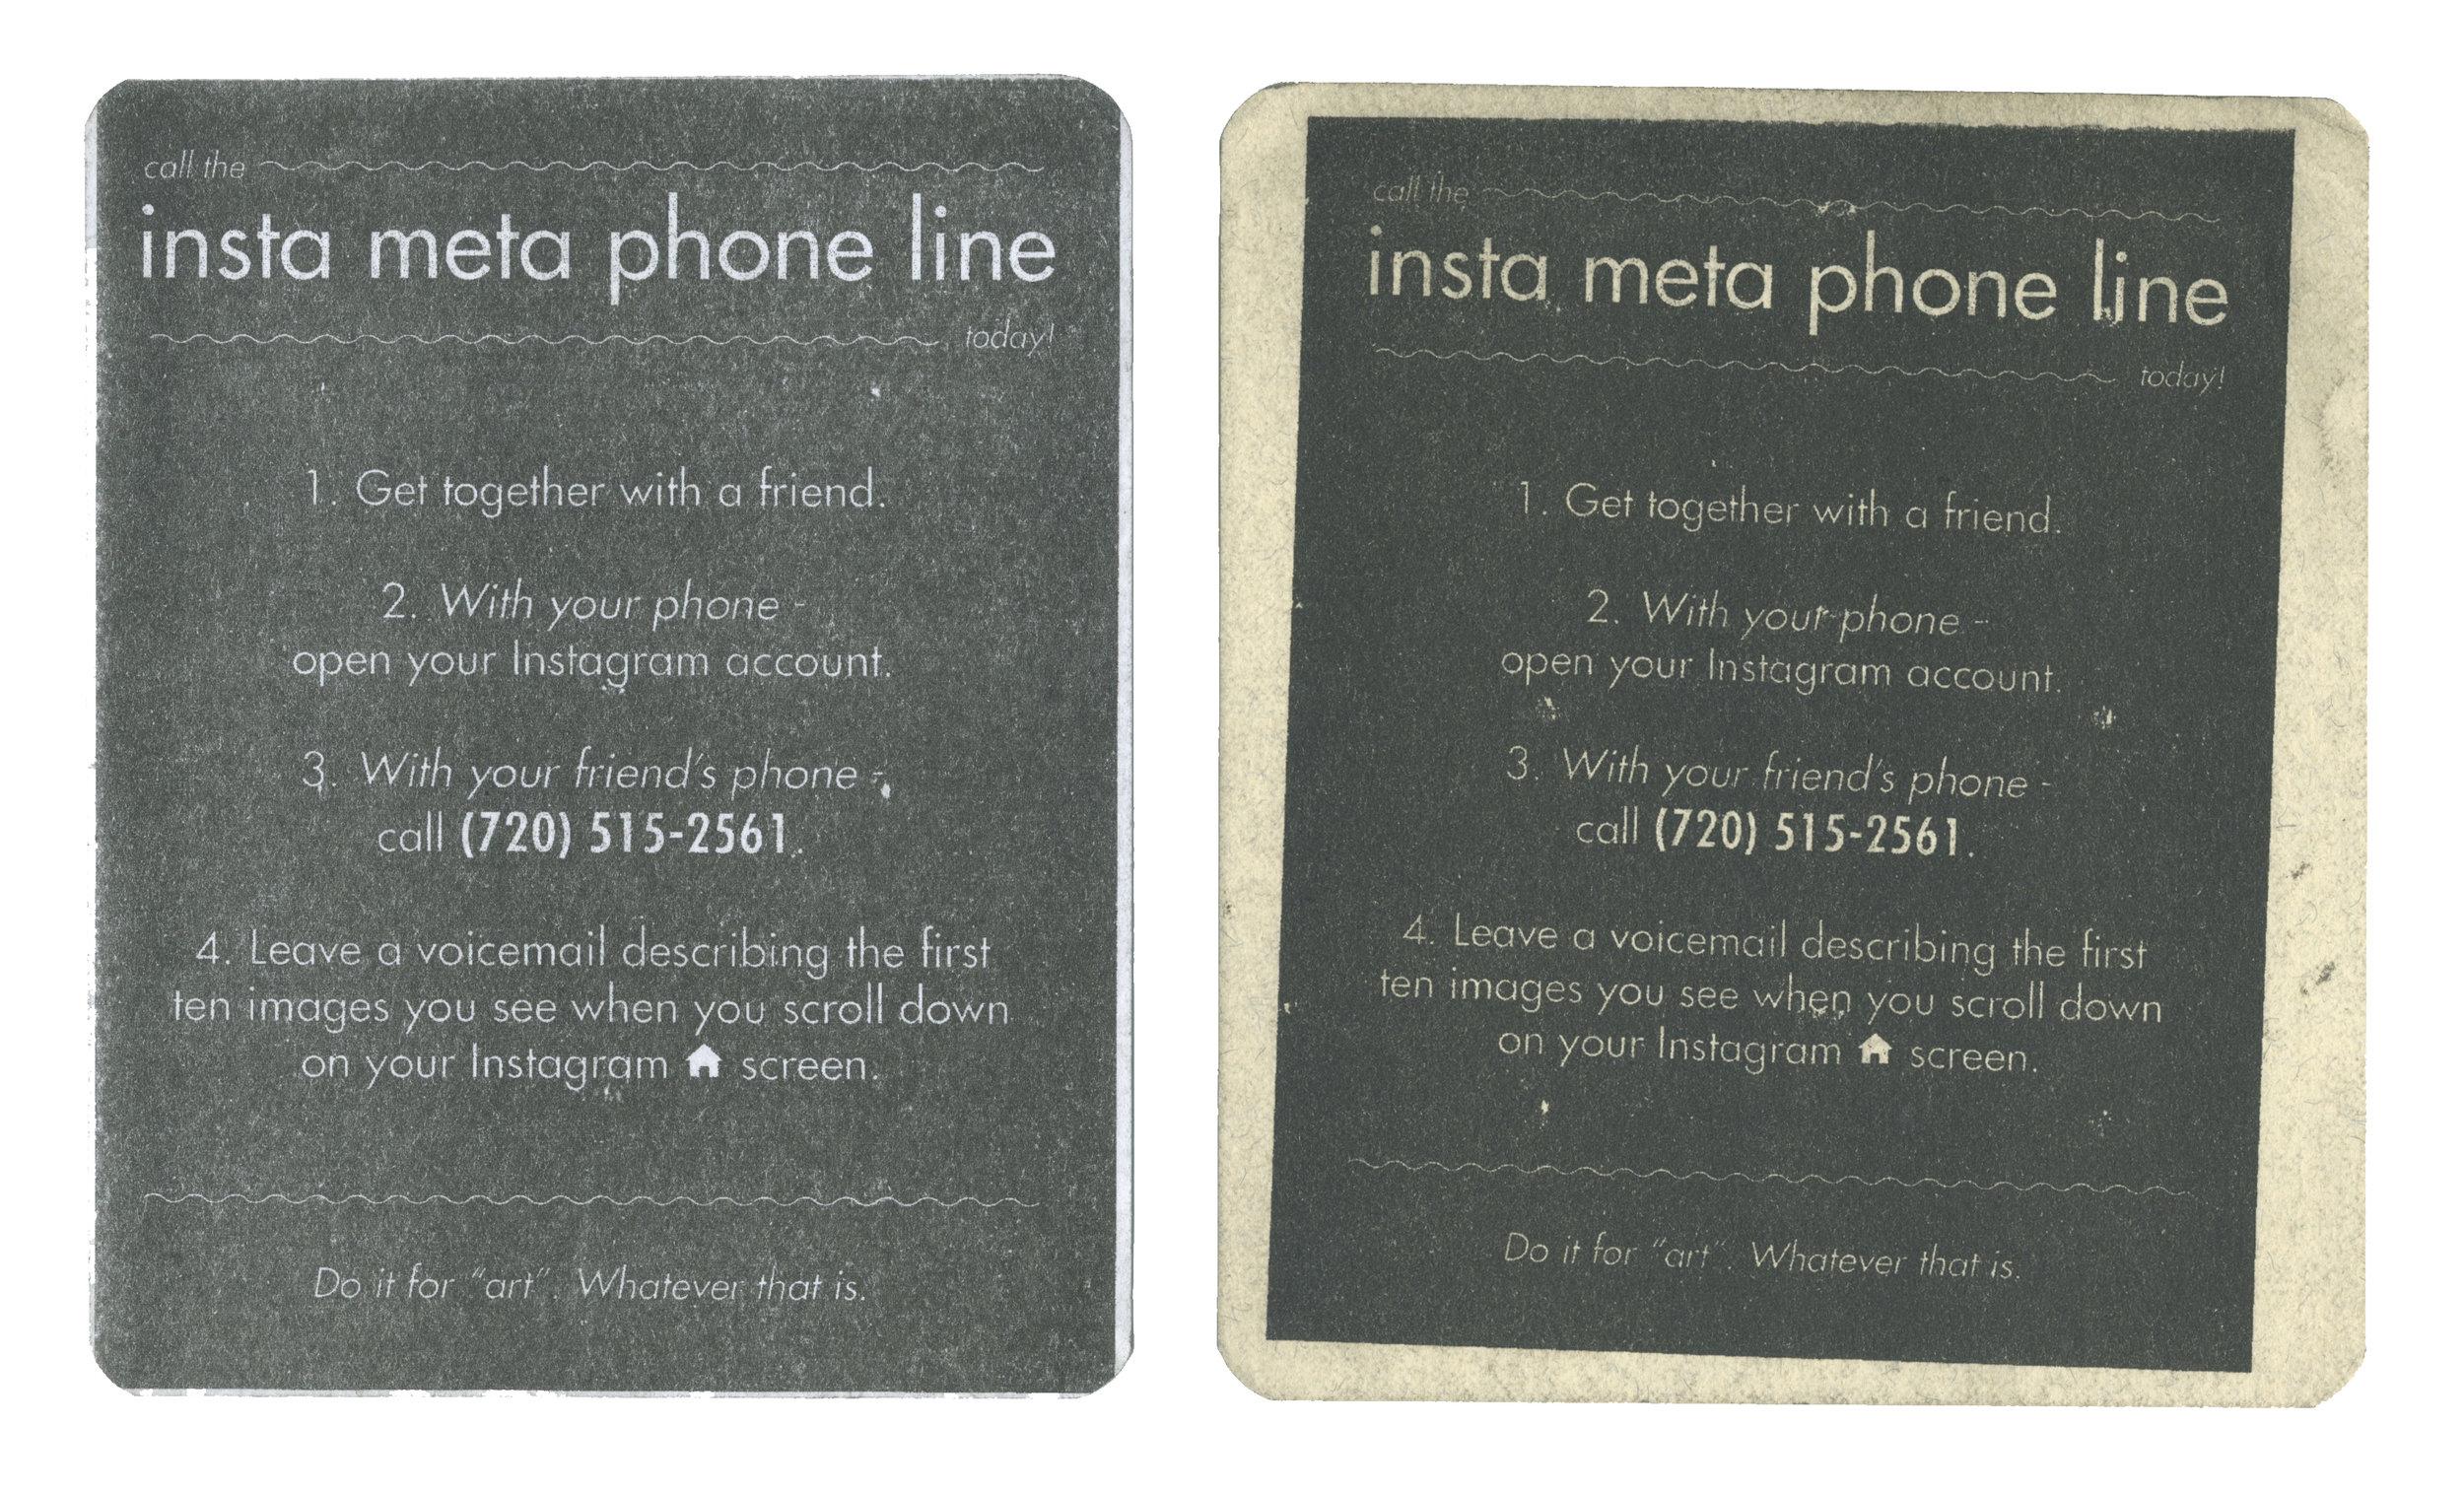 insta meta phone line header.jpg